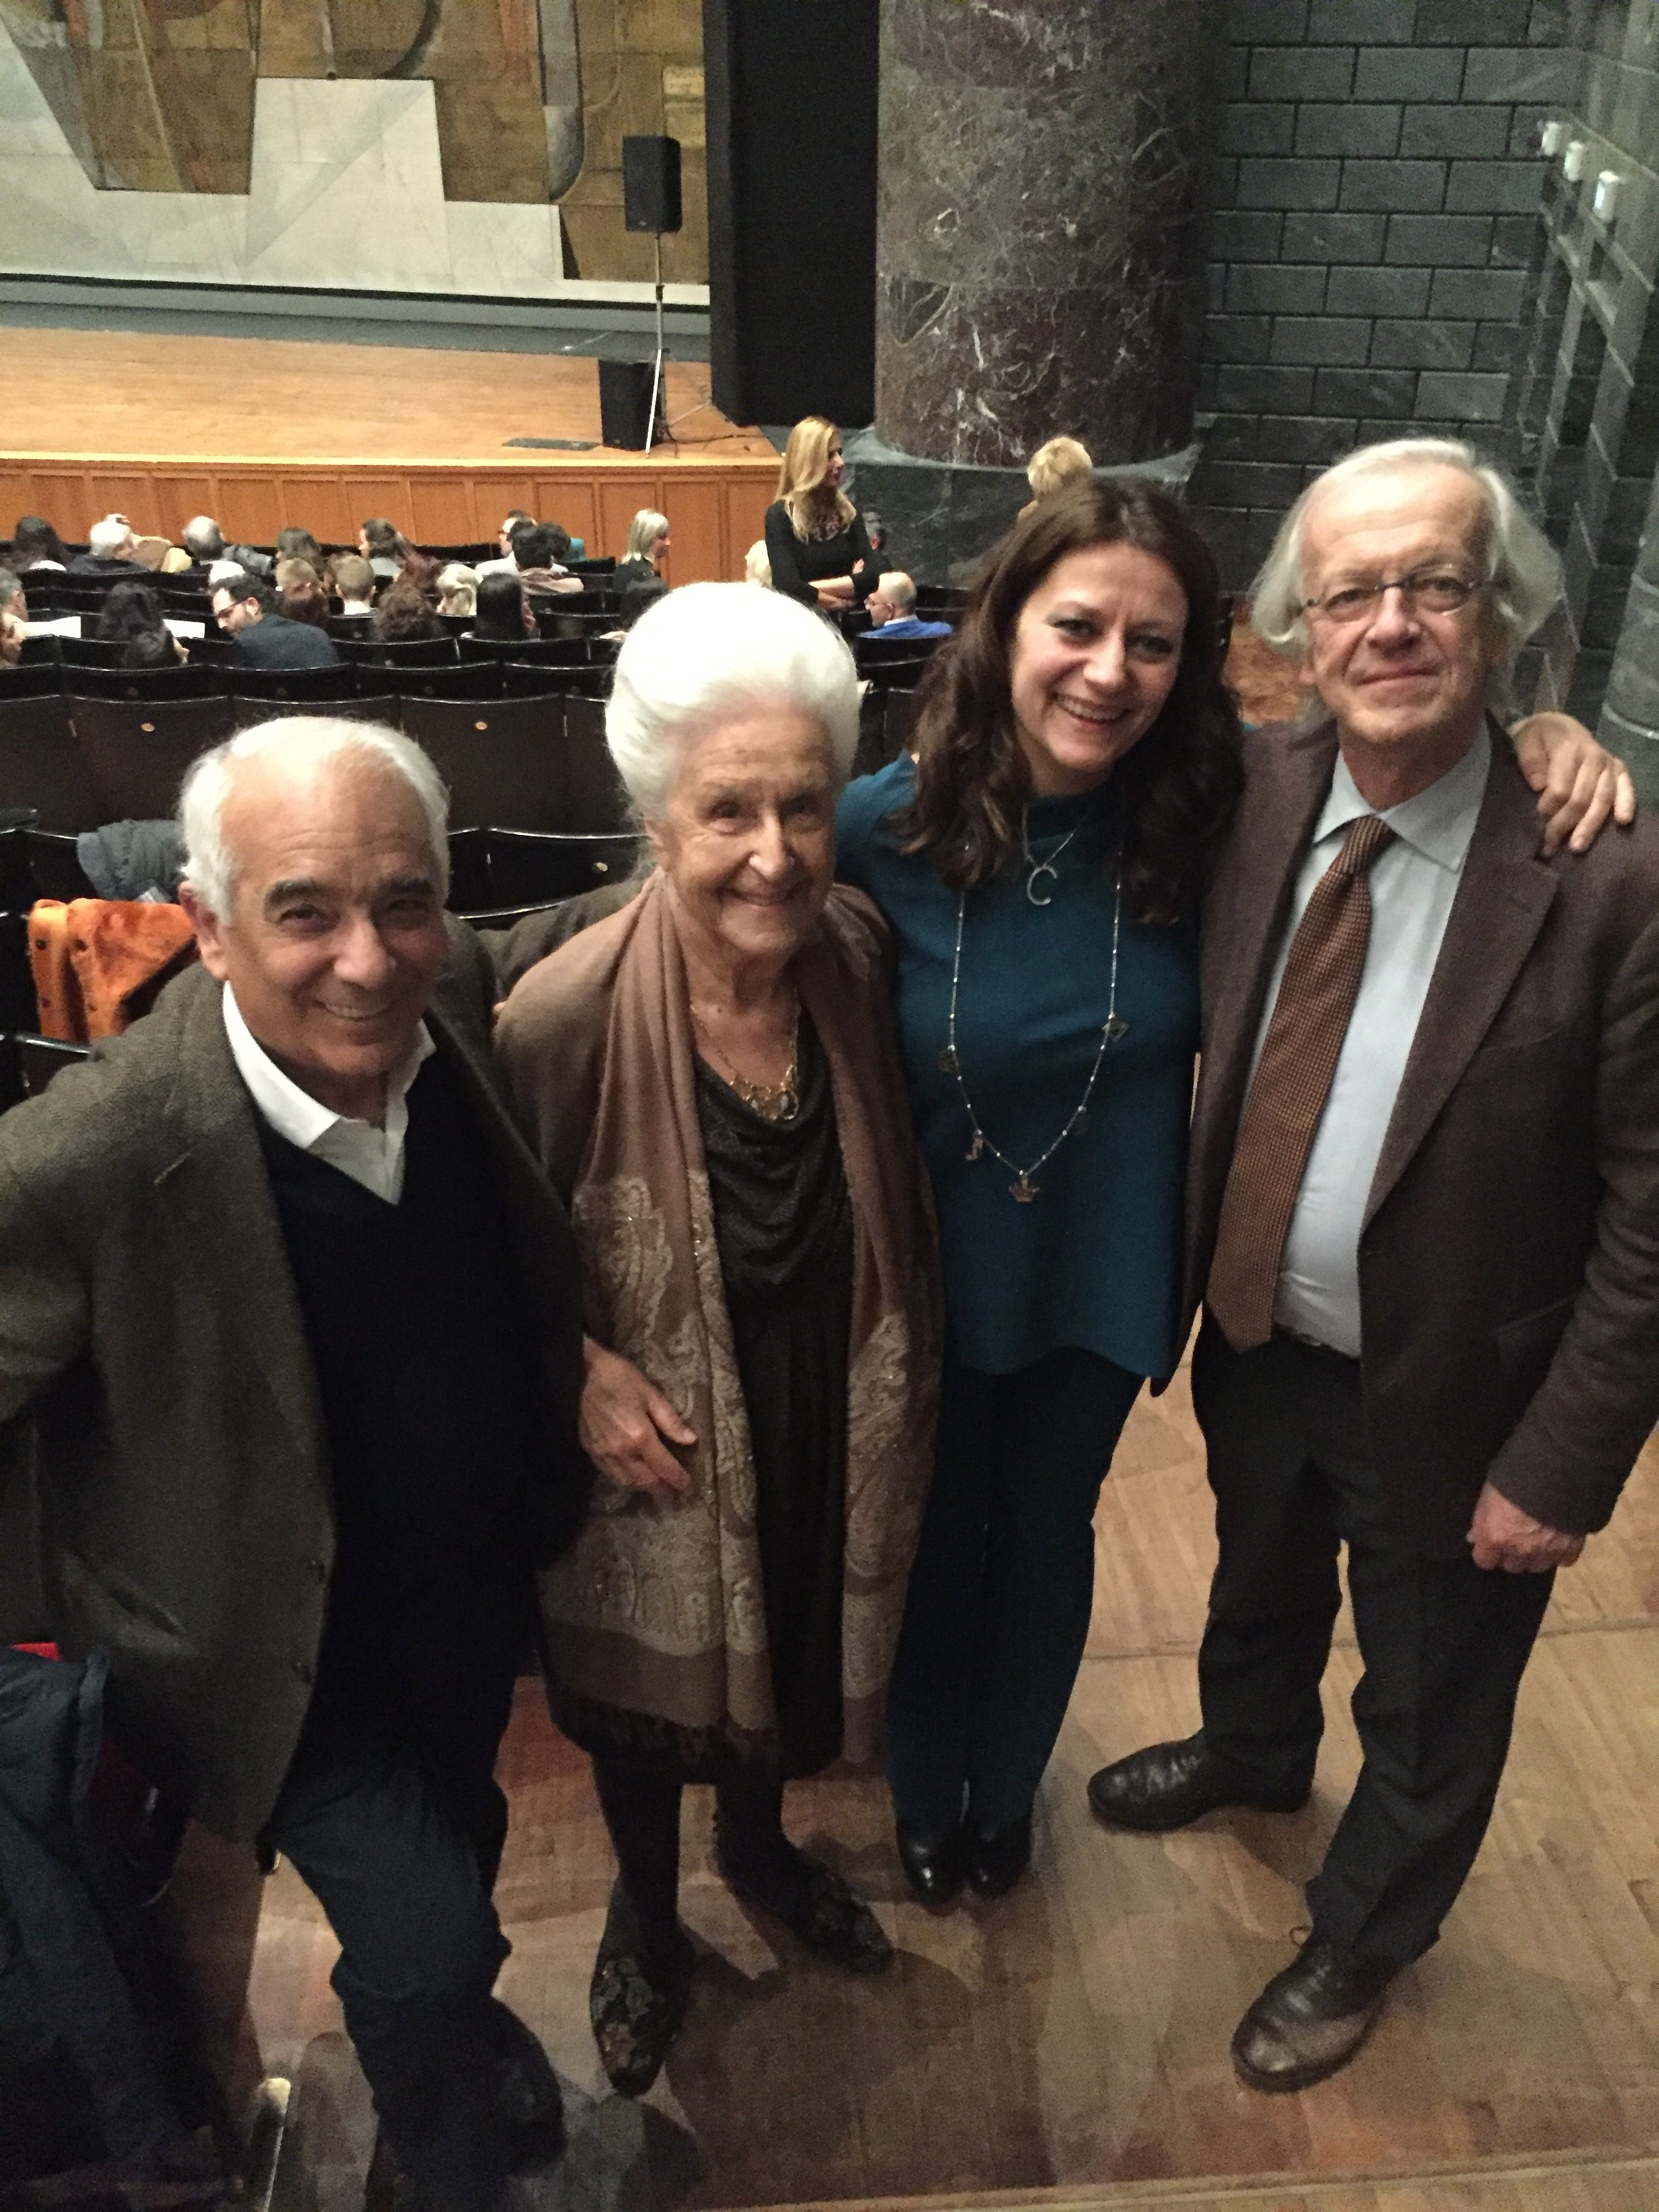 ALDO BENNICI, LIDIA BALDECCHI ARCURI, CARLA MAGNAN E PIETRO BORGONOVO, GENOVA TEATRO CARLO FELICE 2018